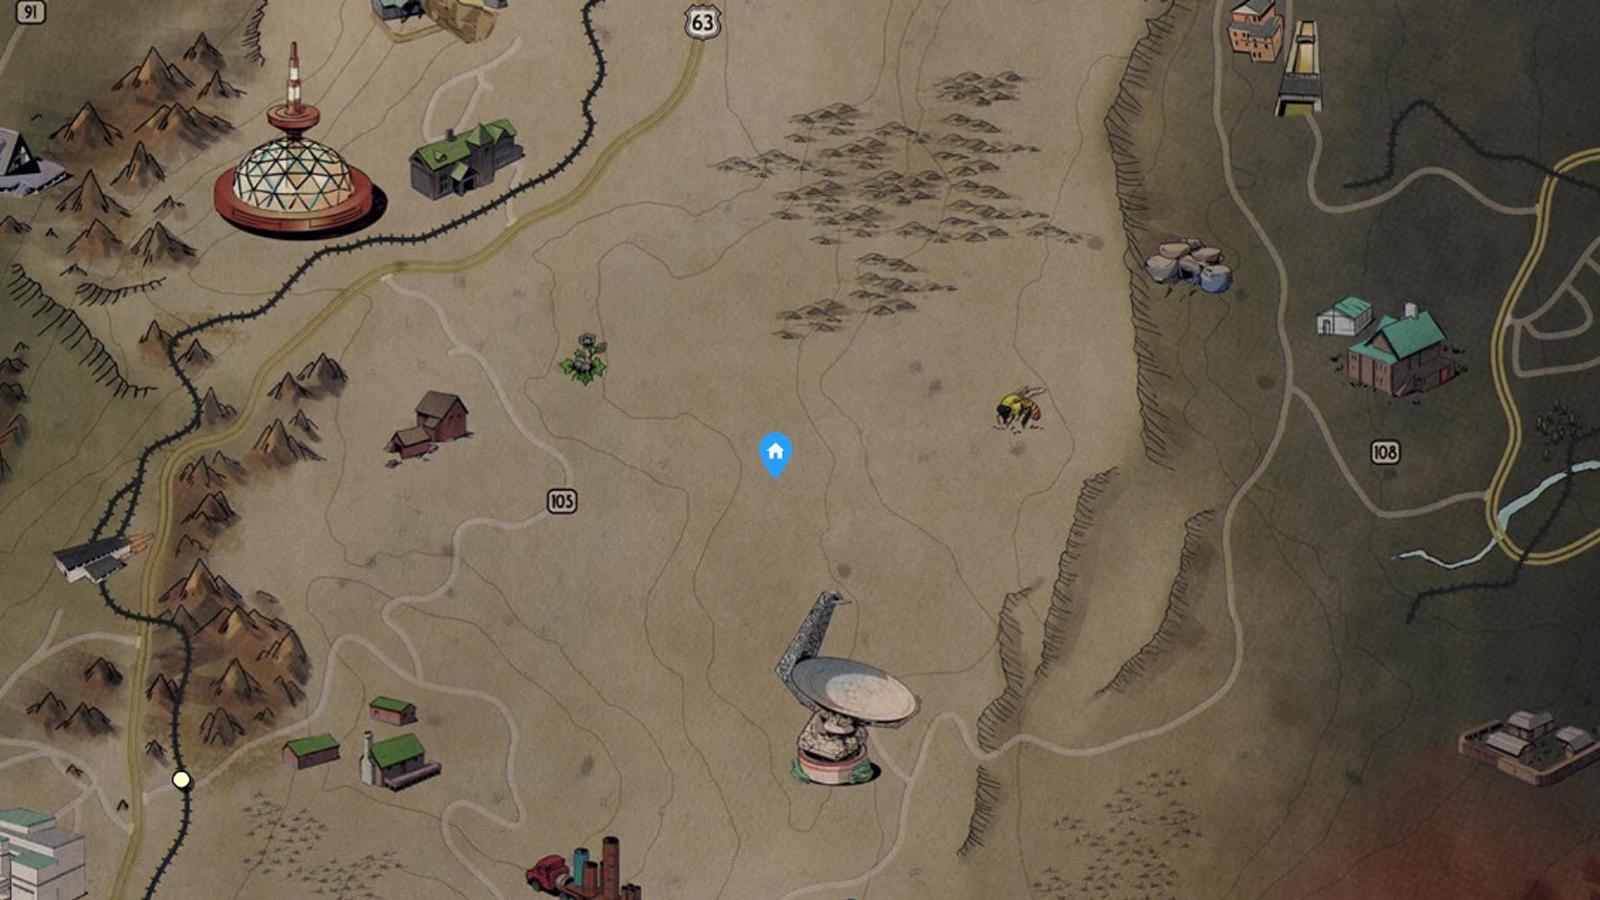 Fallout 76 Nuke Codes - Site Alpha, Bravo, Charlie Nuke